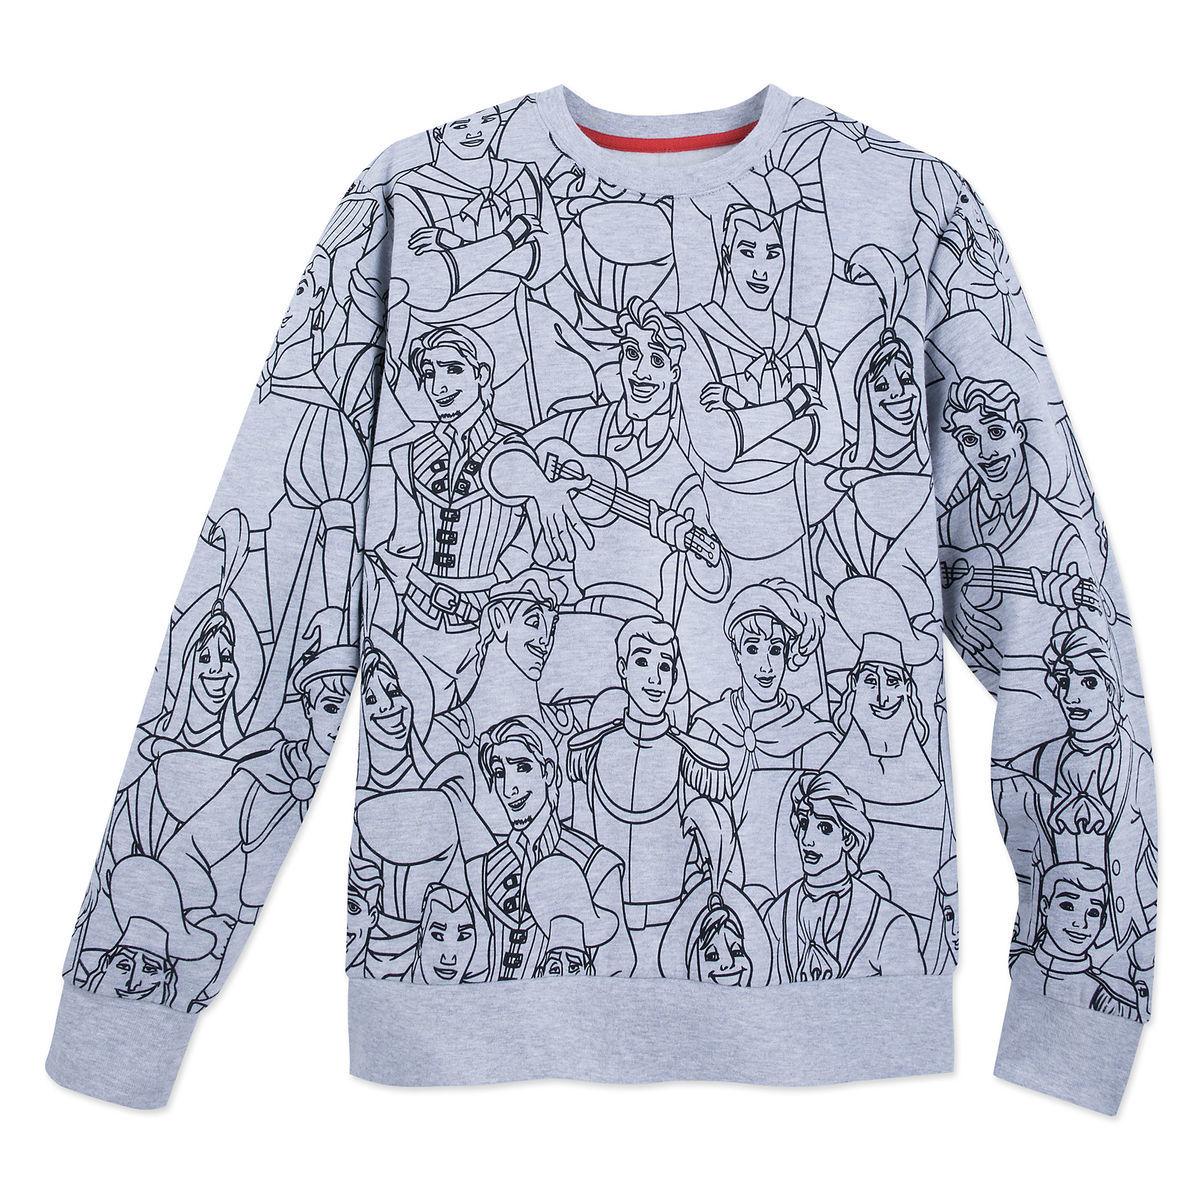 princes sweatshirt